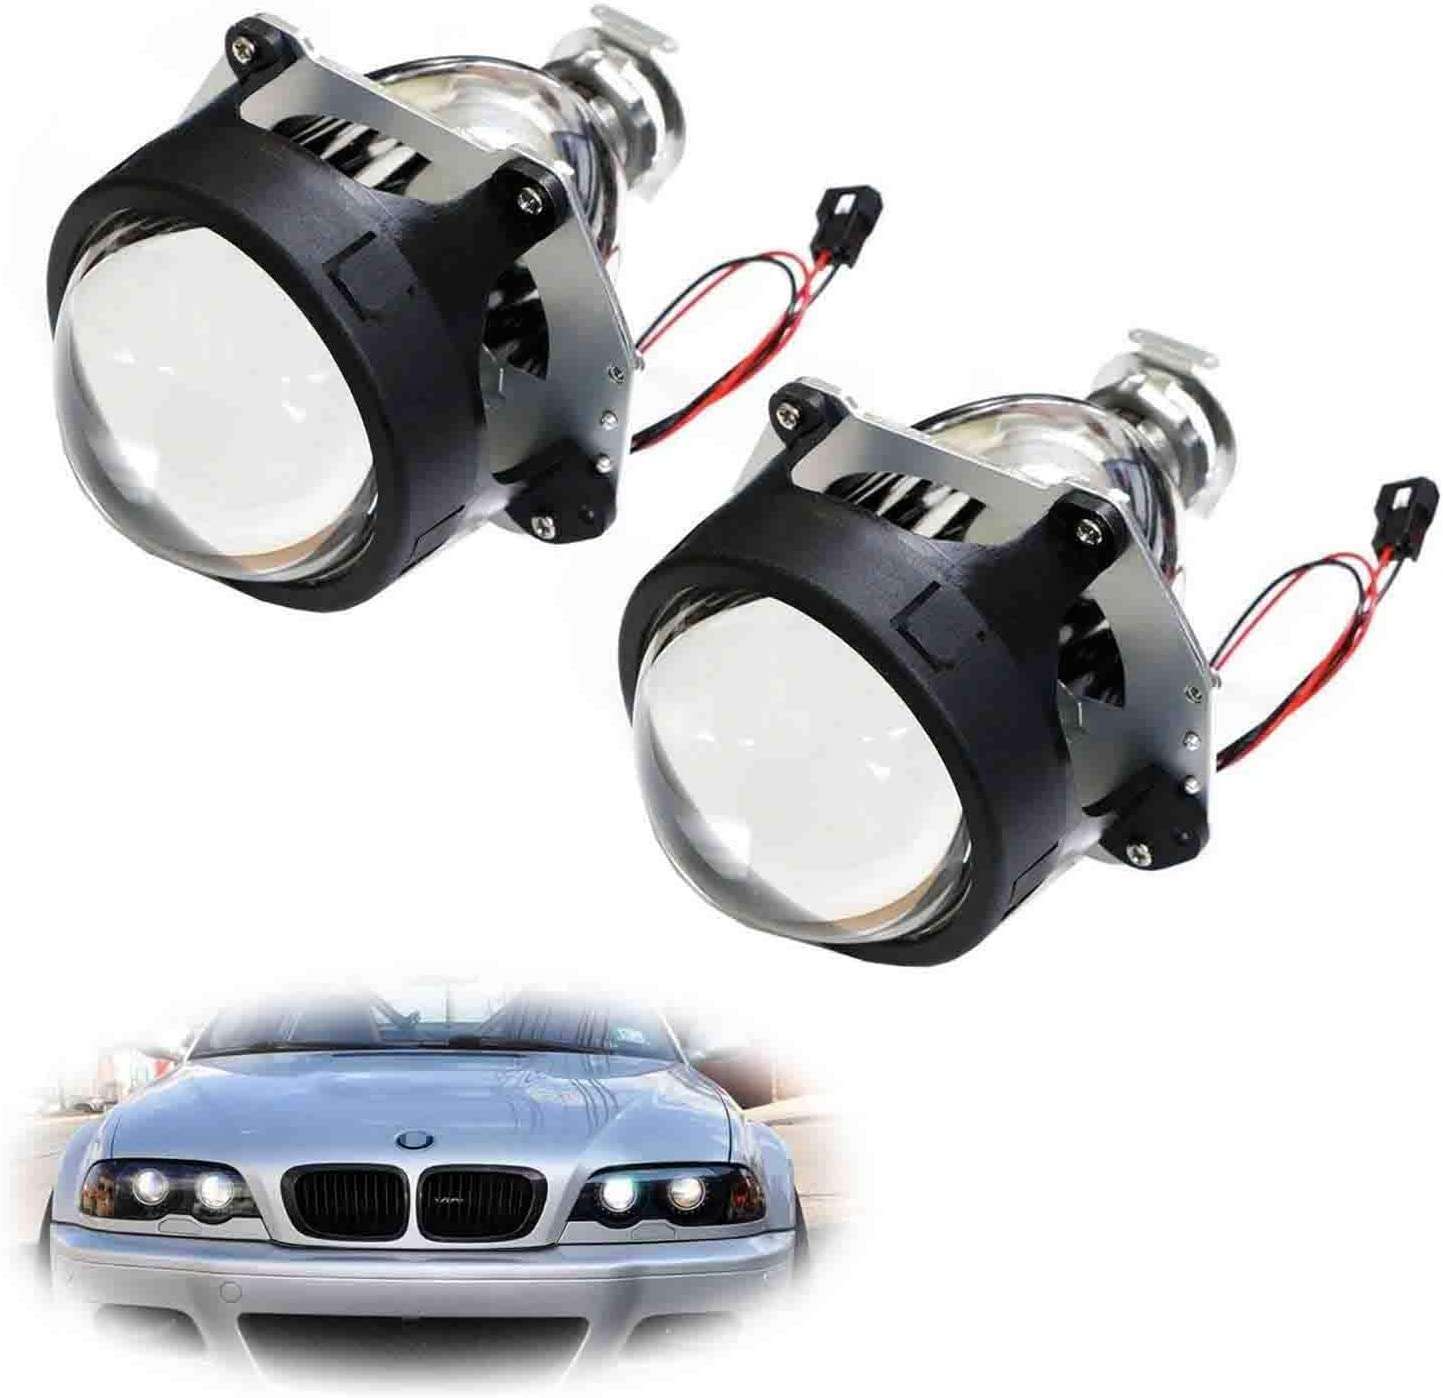 iJDMTOY (2) 3.0-Inch H1 Bi-Xenon HID Projector Lens Compatible With Headlights Retrofit, Custom Headlamps Conversion